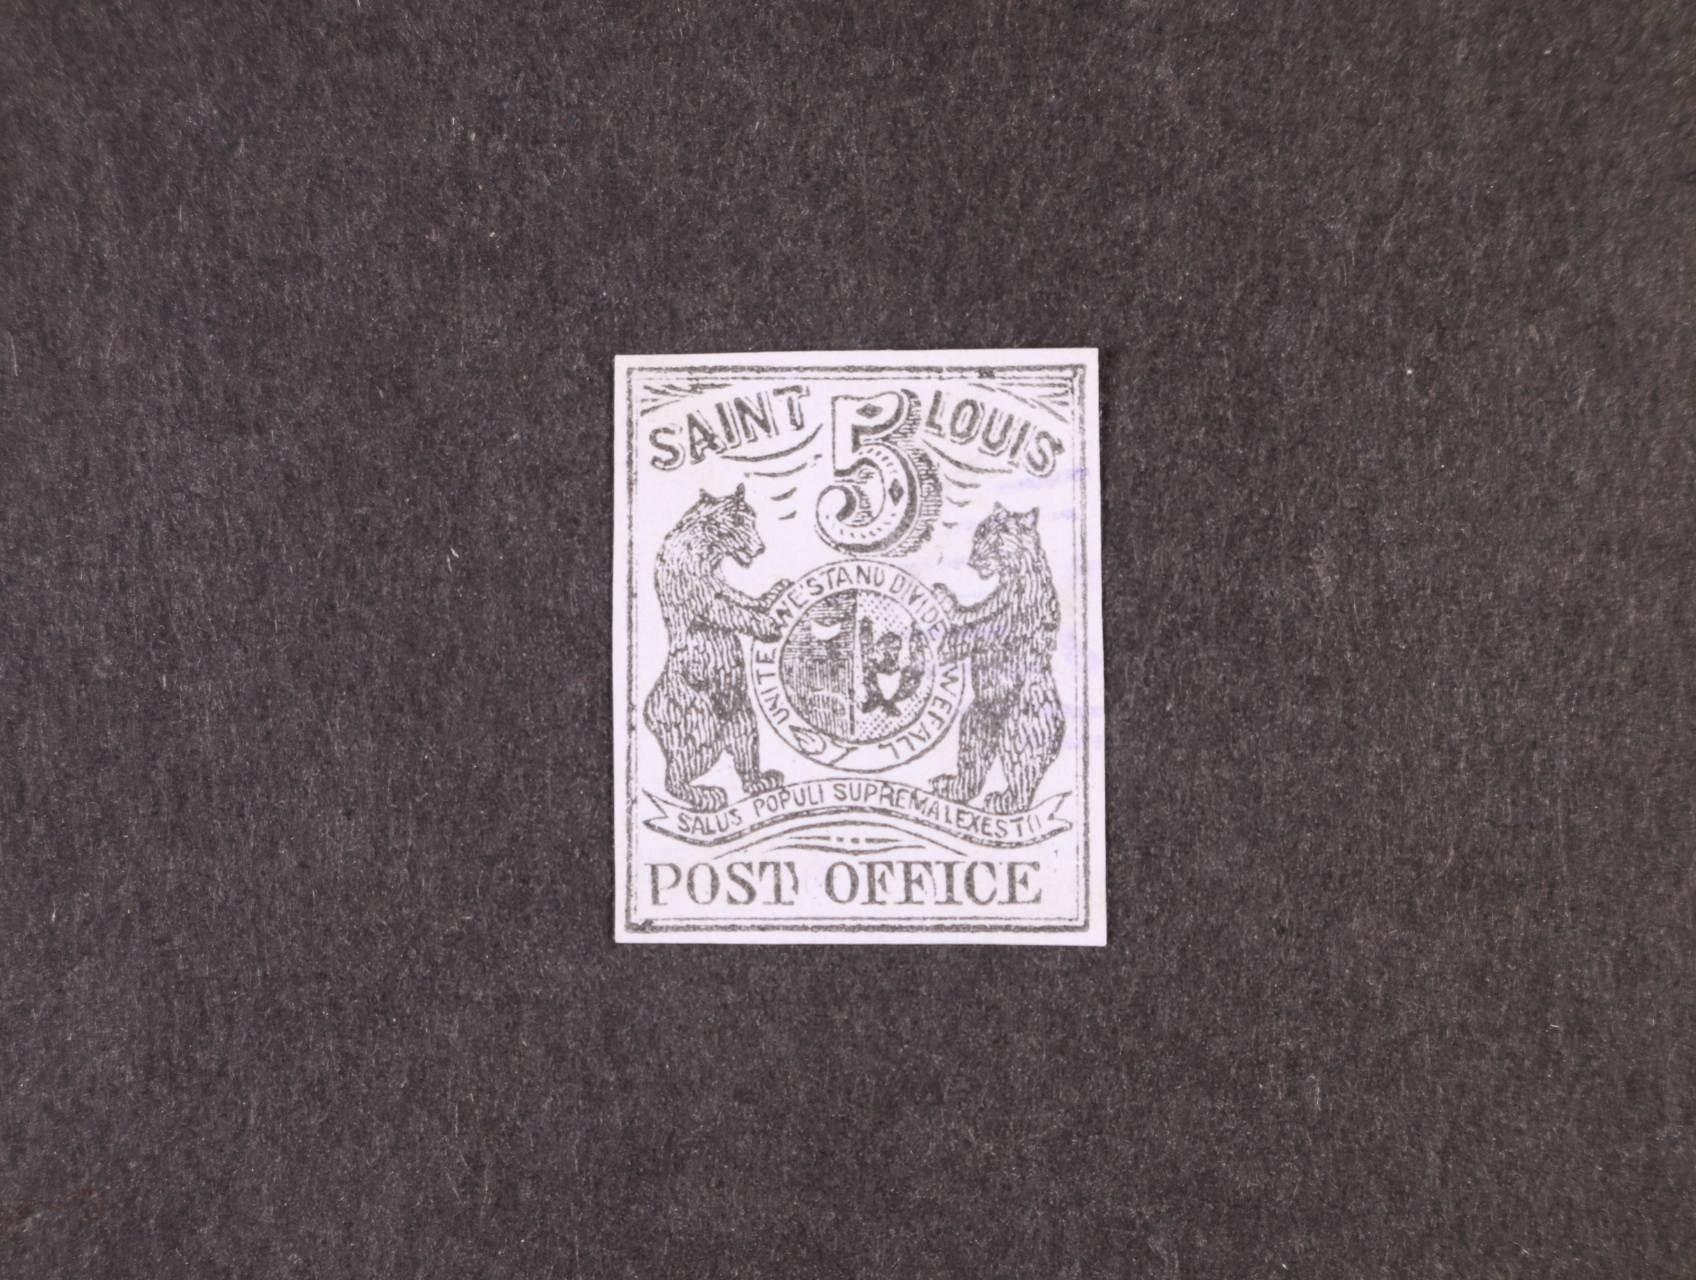 USA - Saint Louis - zn. Yver č. 7, sign. Calves, zajímavé, vzácné, 8000 EUR